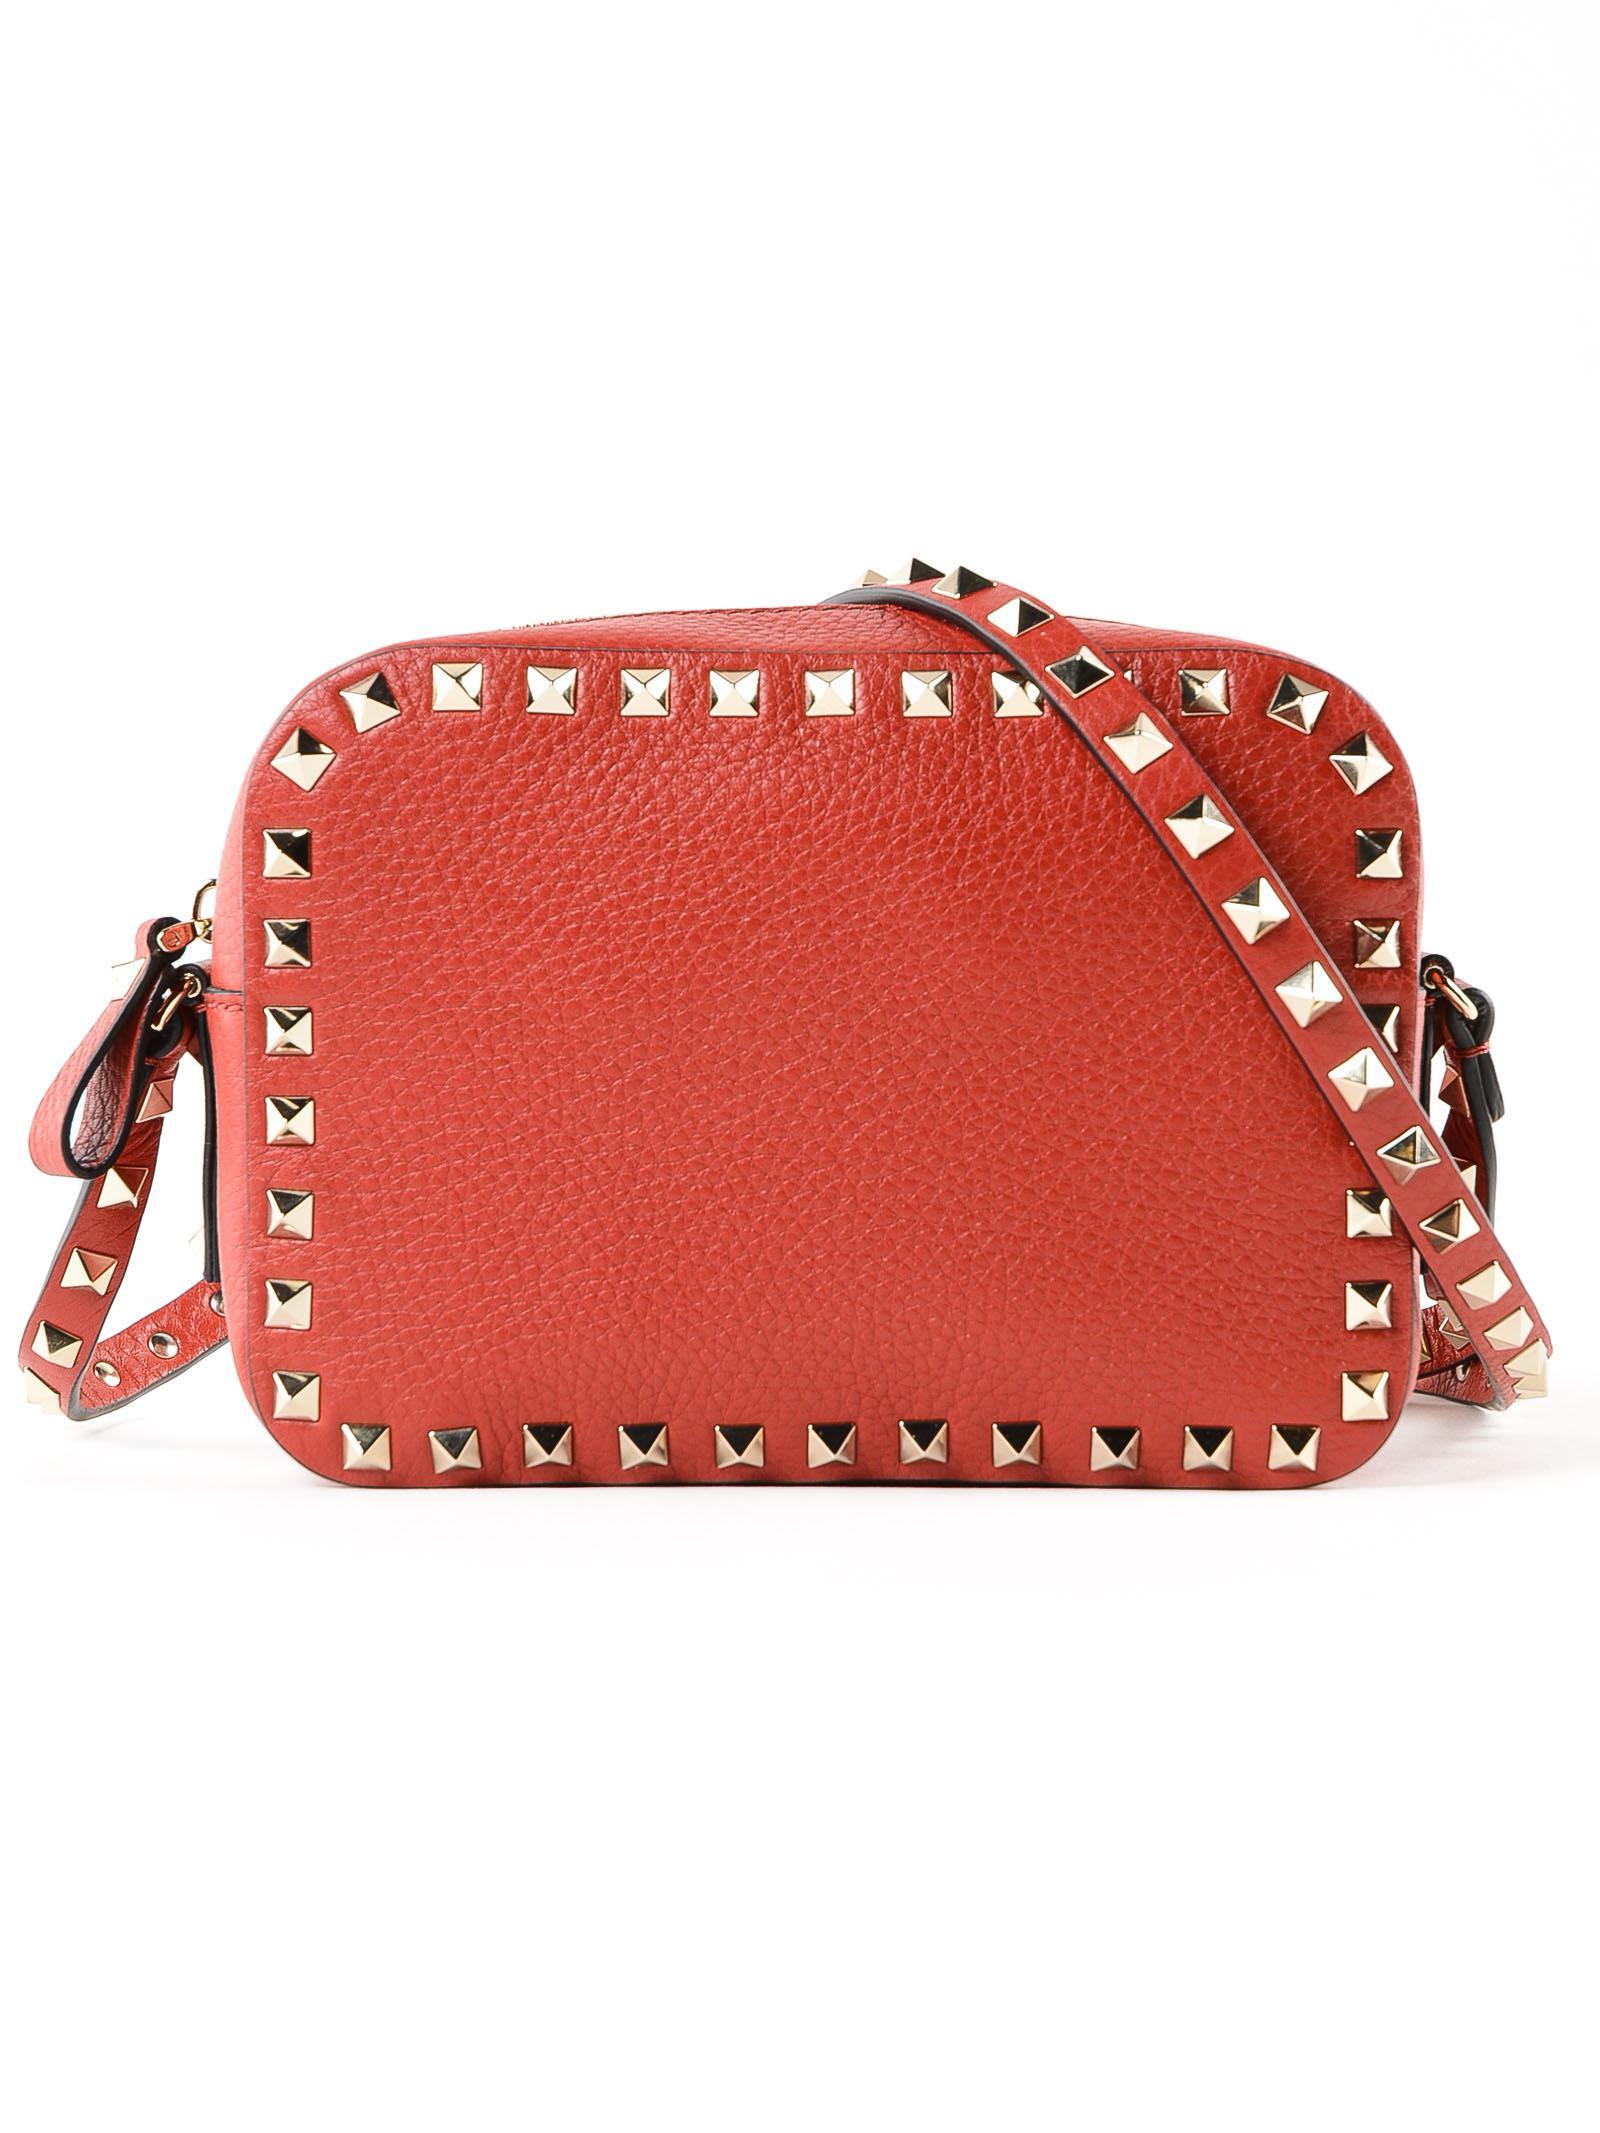 45c9f3e2dd21 Valentino Rockstud Crossbody Bag in Red - Lyst